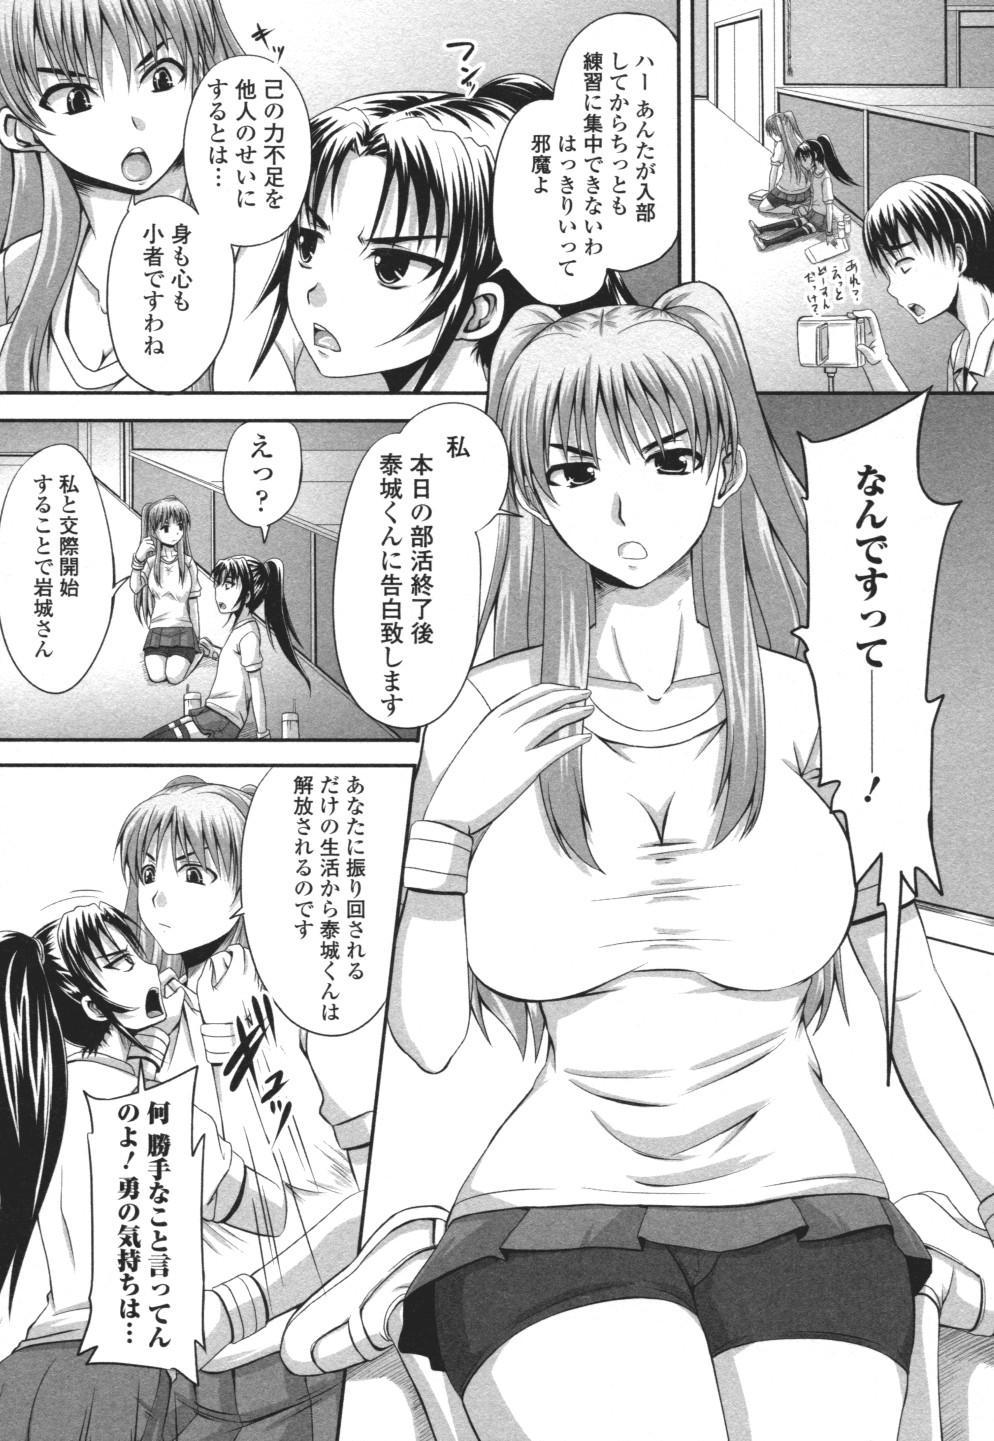 Nozoite wa Ikenai 3 - Do Not Peep! 3 41